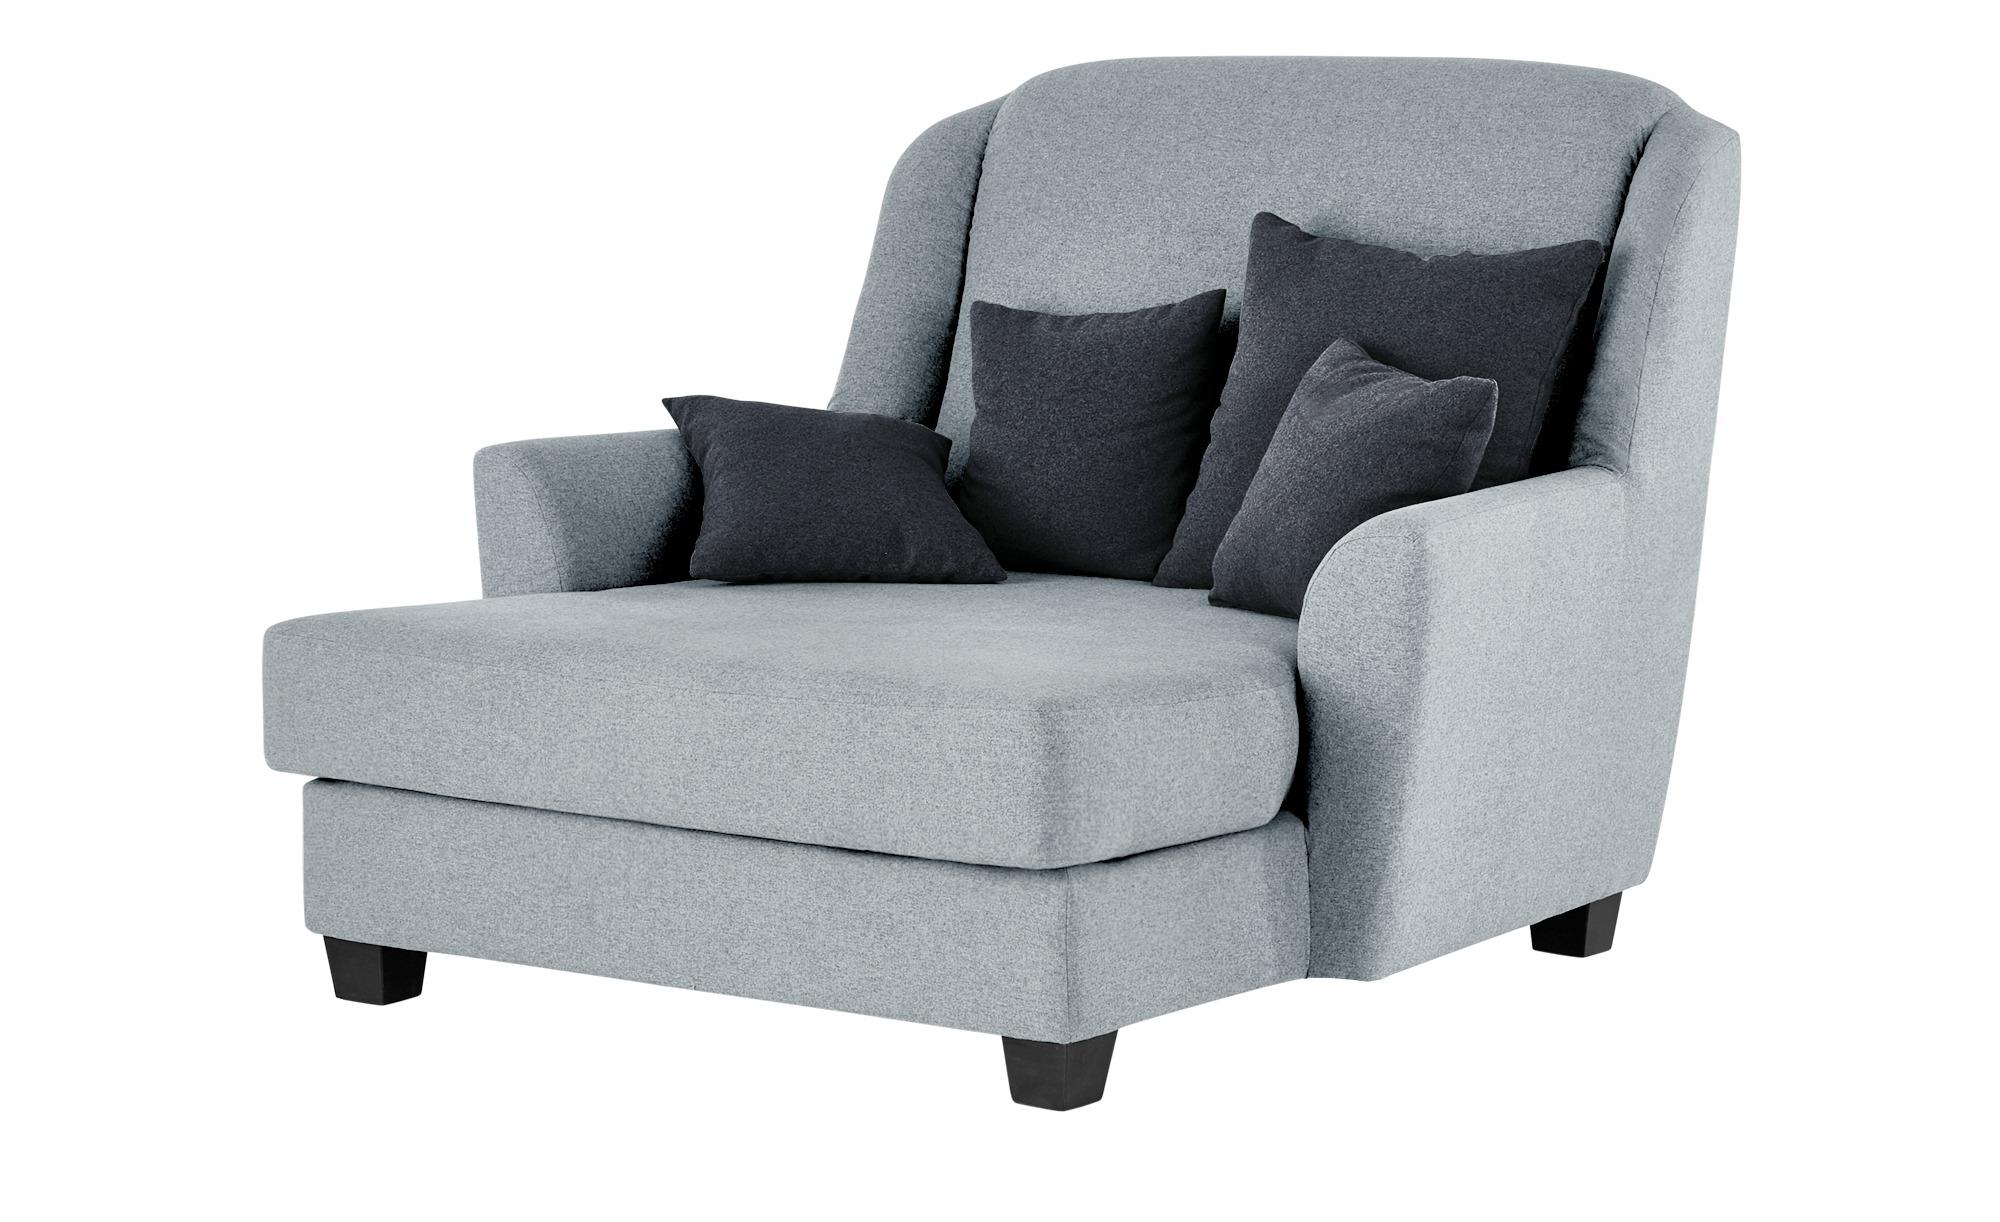 smart Sessel silber - Stoff Lisbeth ¦ grau ¦ Maße (cm): B: 135 H: 100 T: 144 Polstermöbel > Sessel > Ohrensessel - Höffner